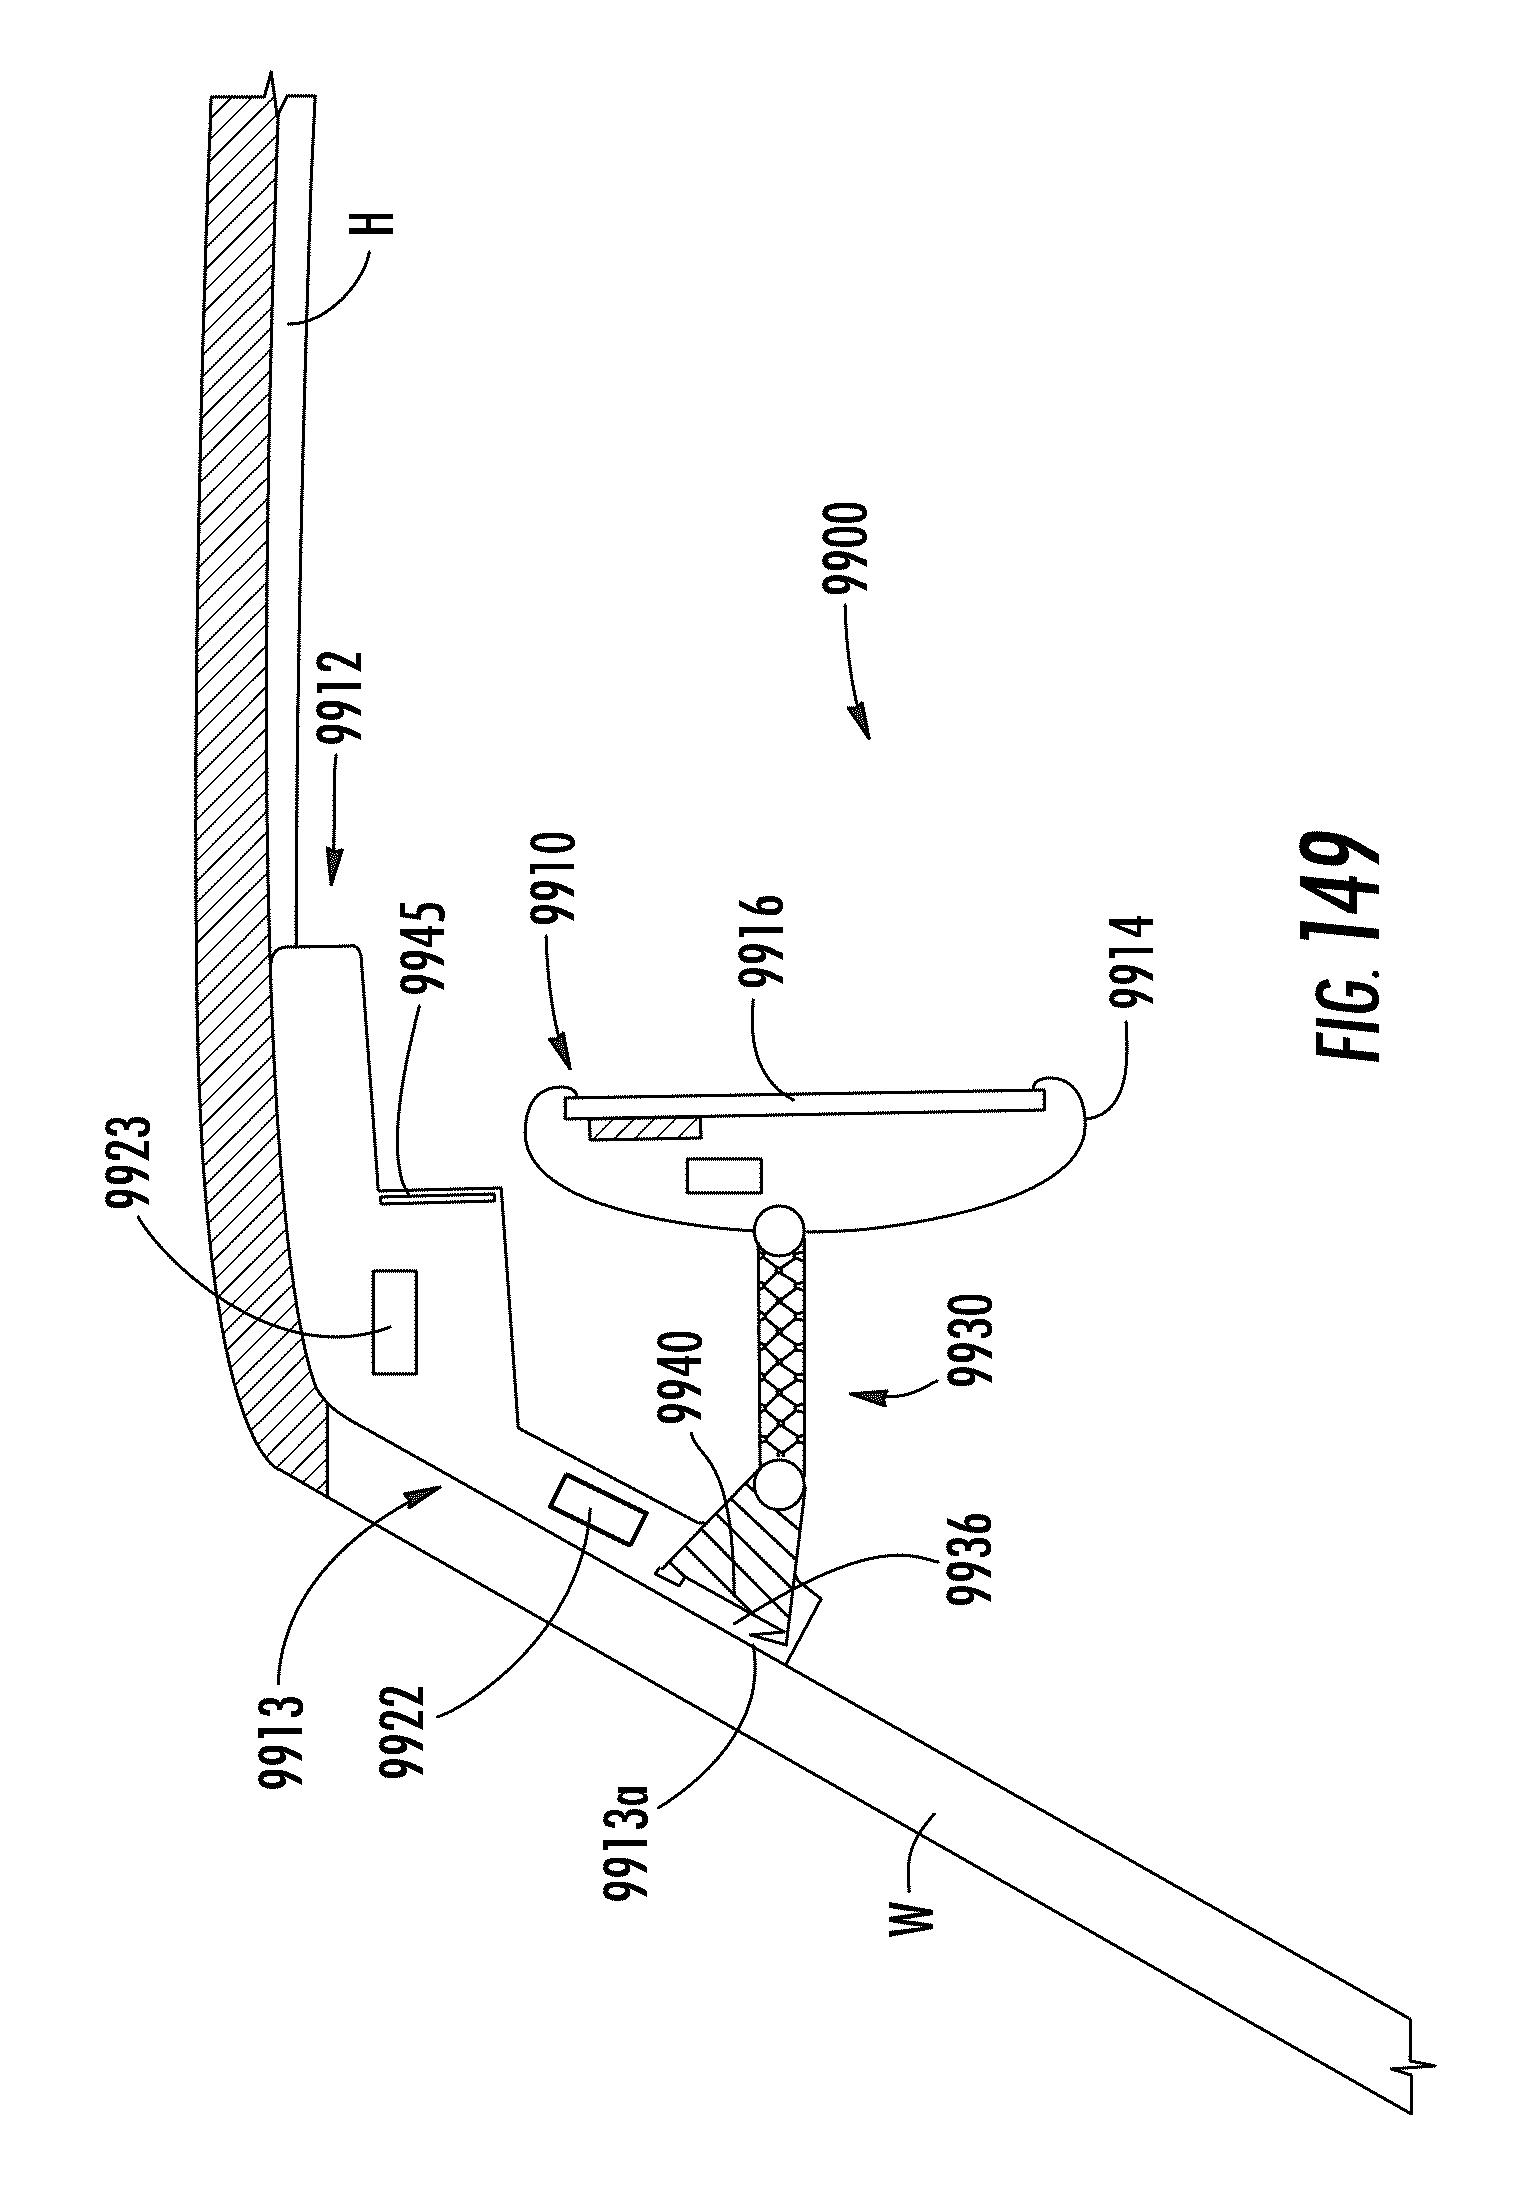 Mercury Et Wiring Diagram Besides Honda Cg 125 Wiring Diagram Moreover